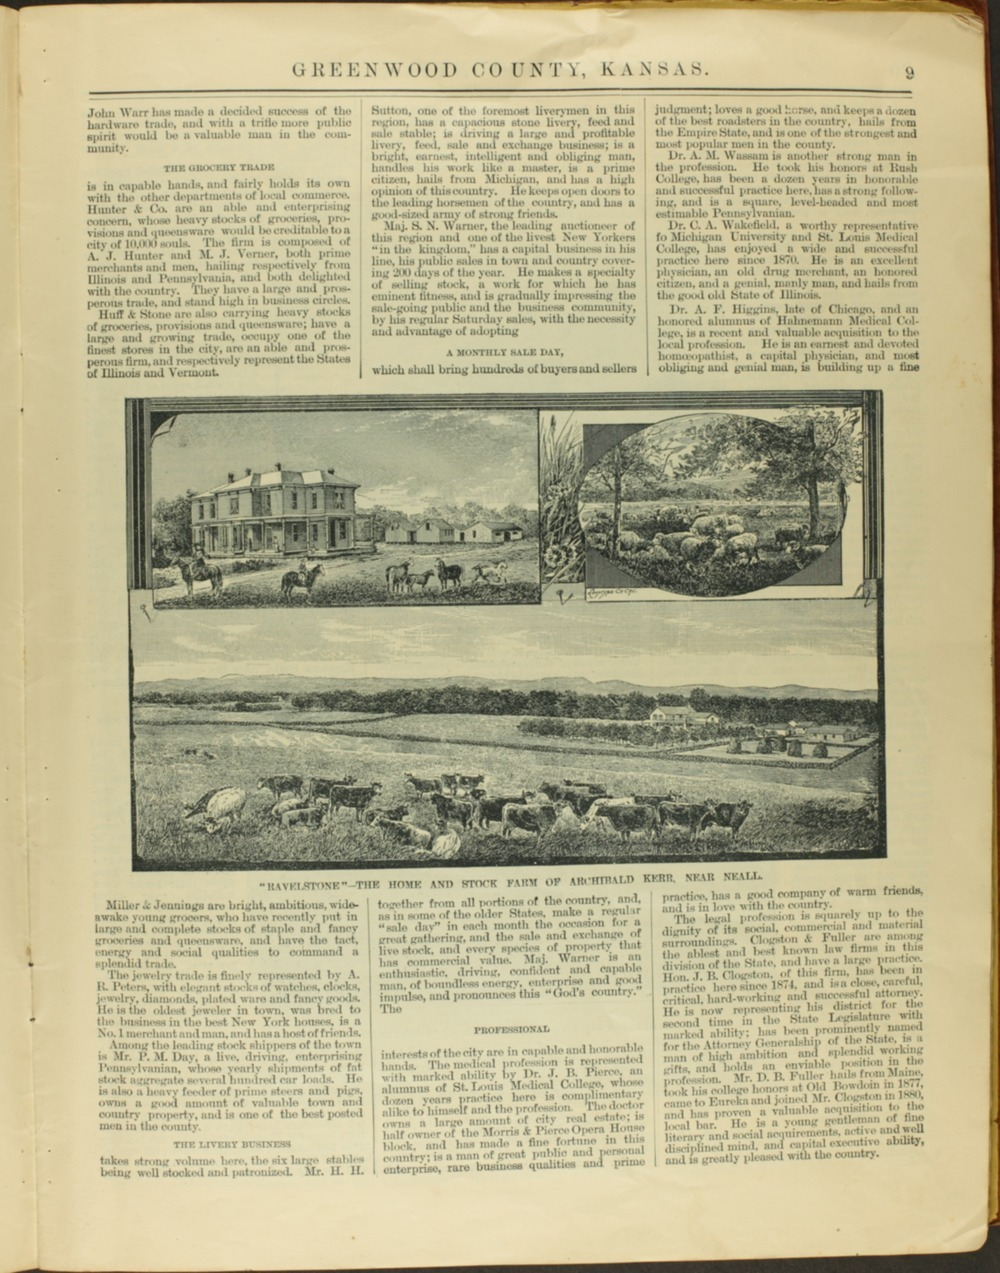 Handbook of Greenwood County, Kansas - 9